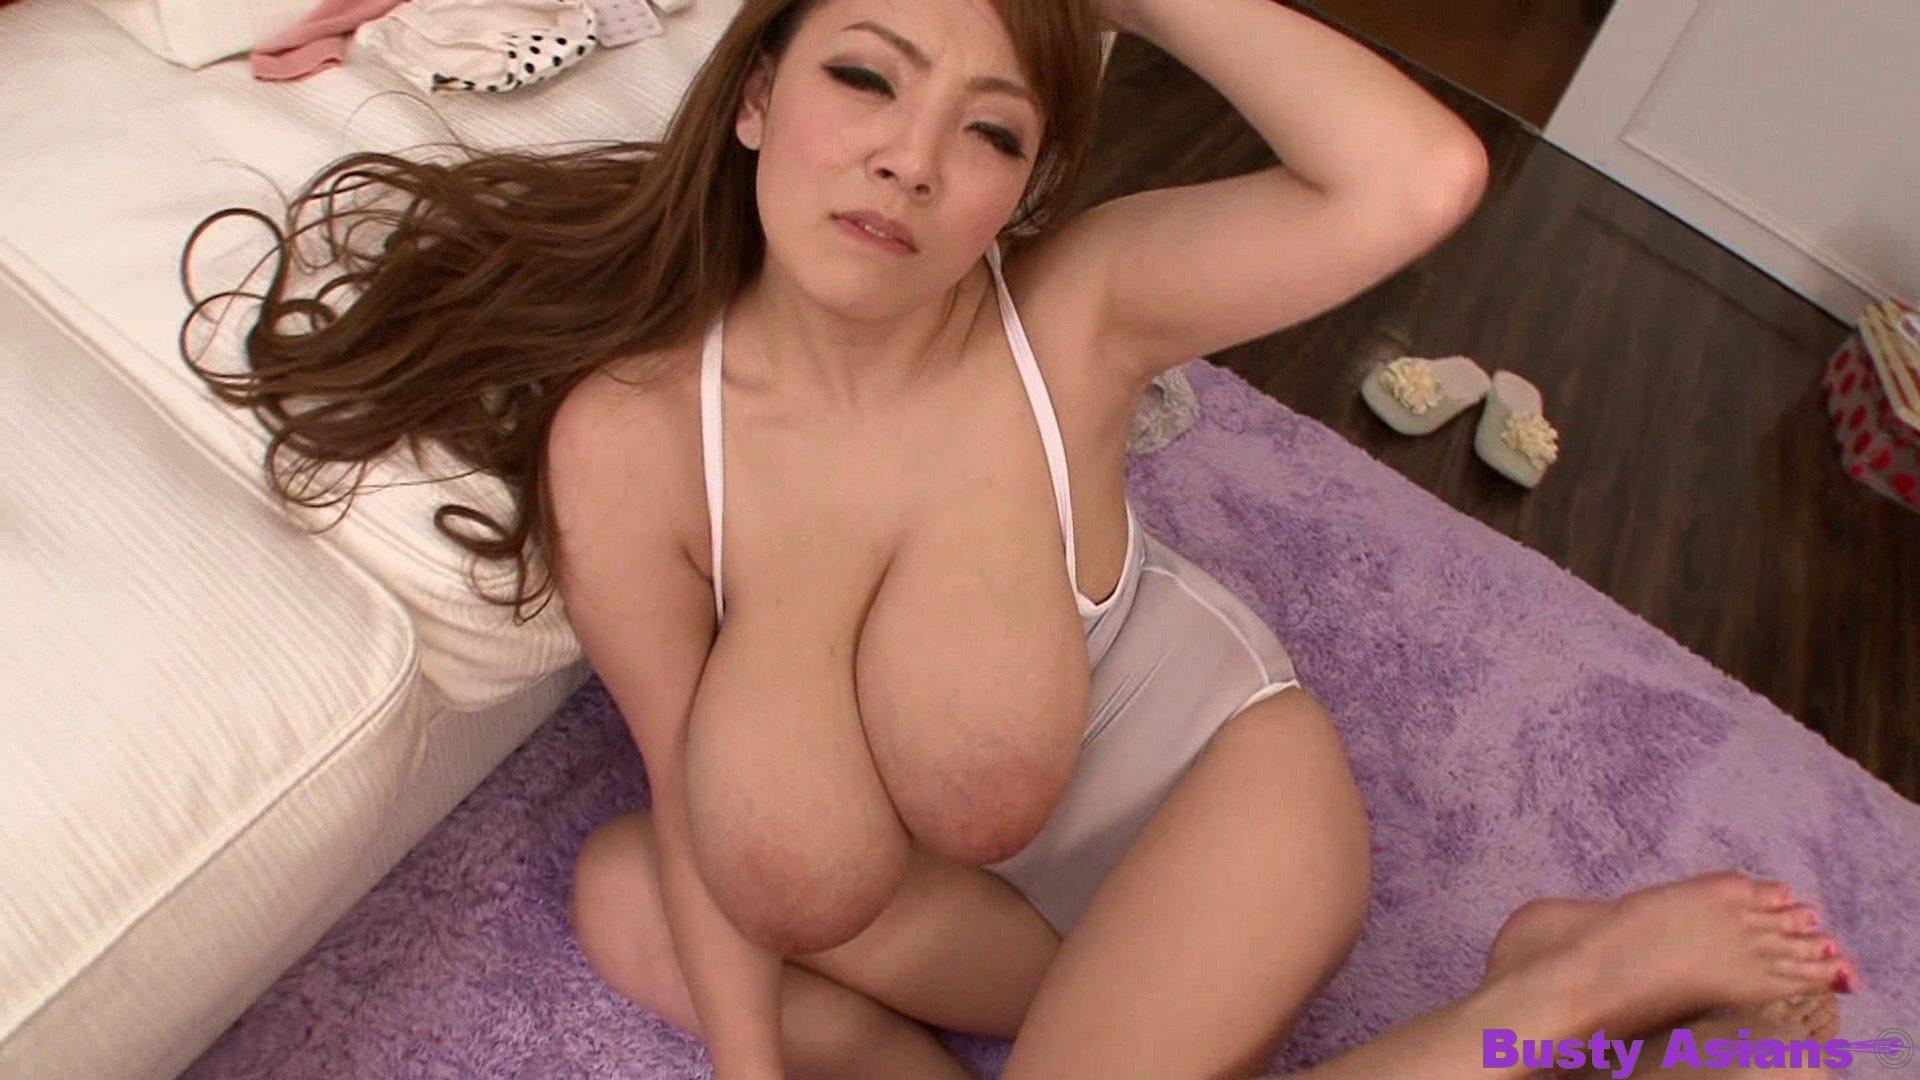 Maureen larazabal sex scenes